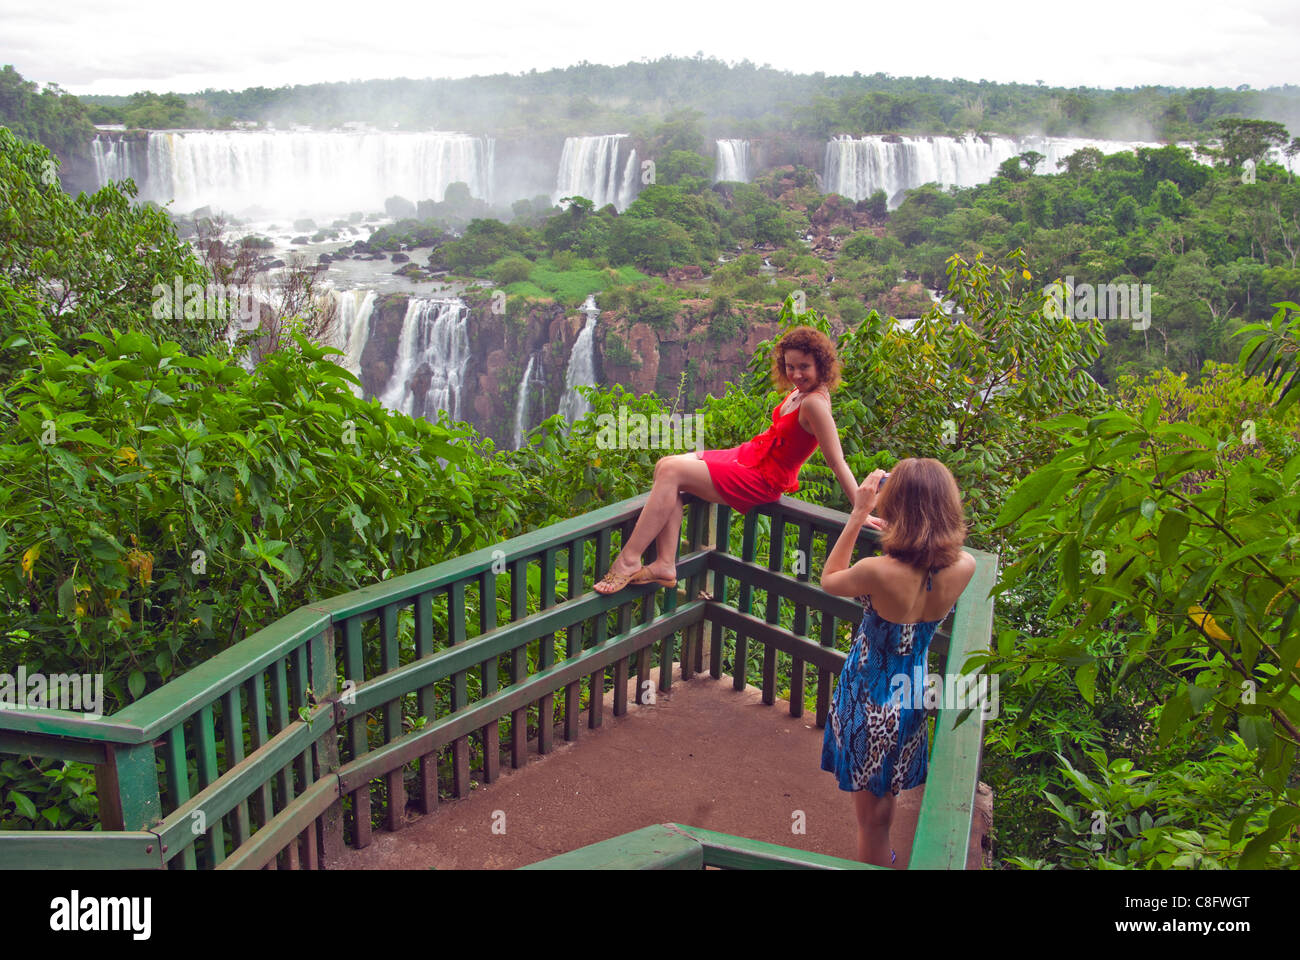 2 girls, model shoot on platform, Iguazu, Iguaçu Falls, Cataratas do Iguaçu, Cataratas del Iguazú. - Stock Image